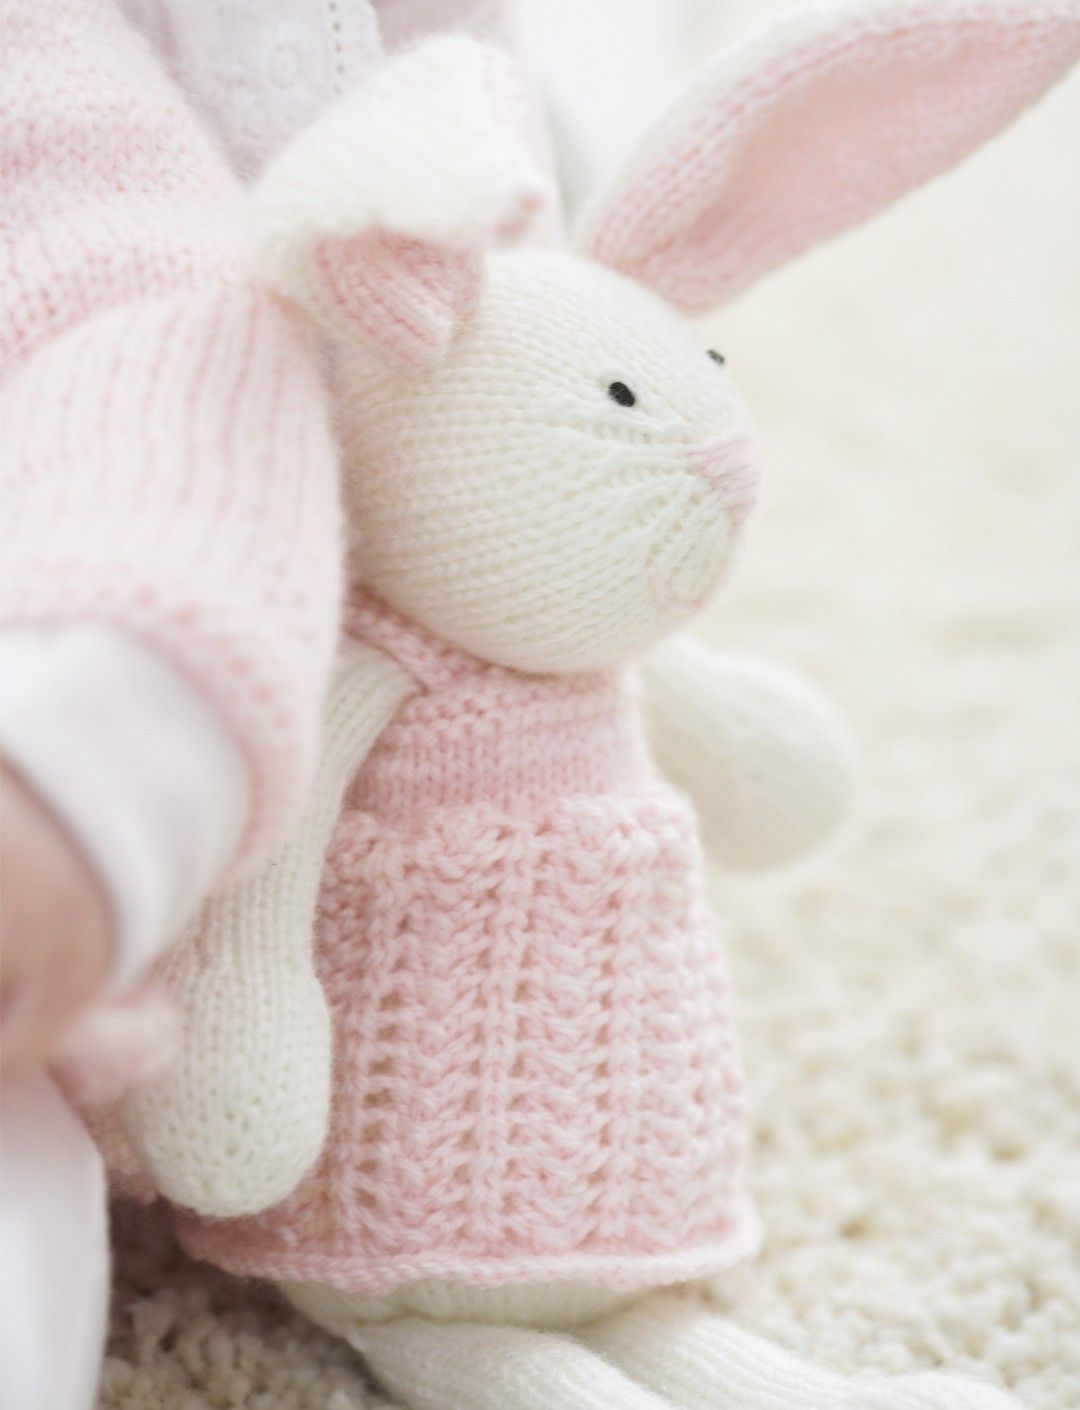 Zoe bunny free pattern download diy pinterest bunny free zoe bunny free pattern download bankloansurffo Images